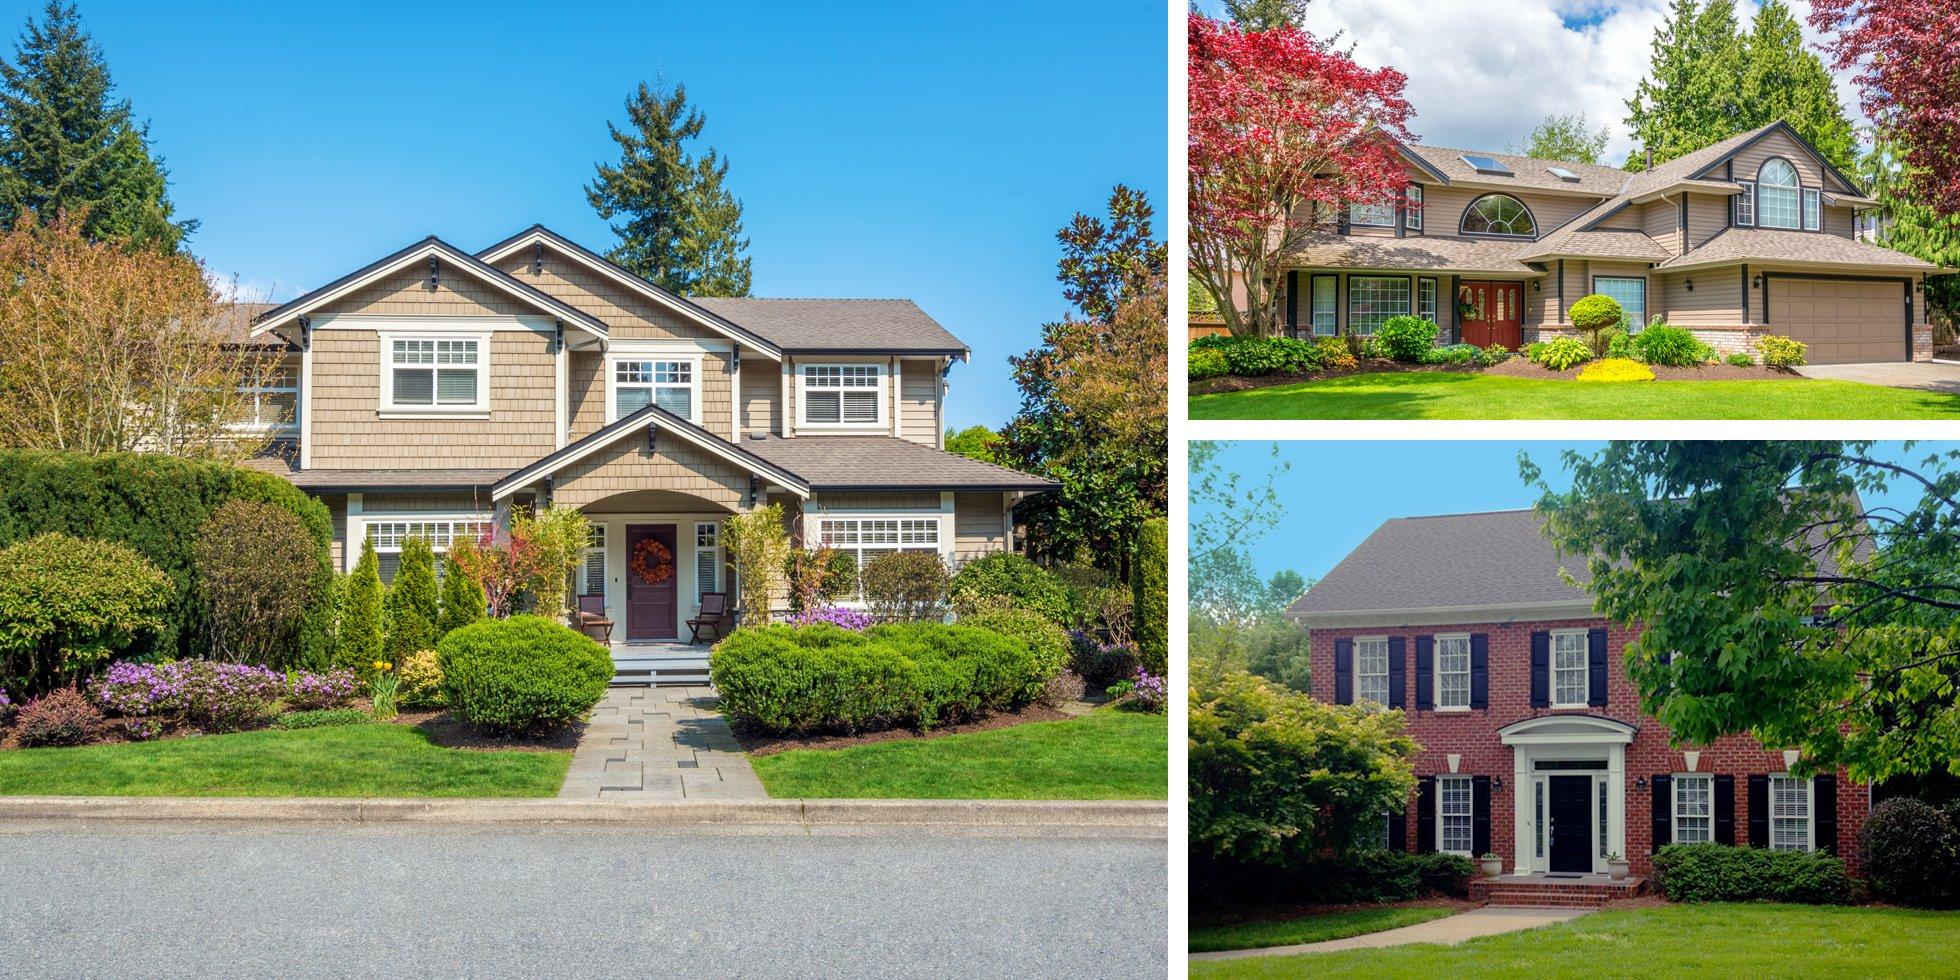 Winston Salem, NC houses for sale